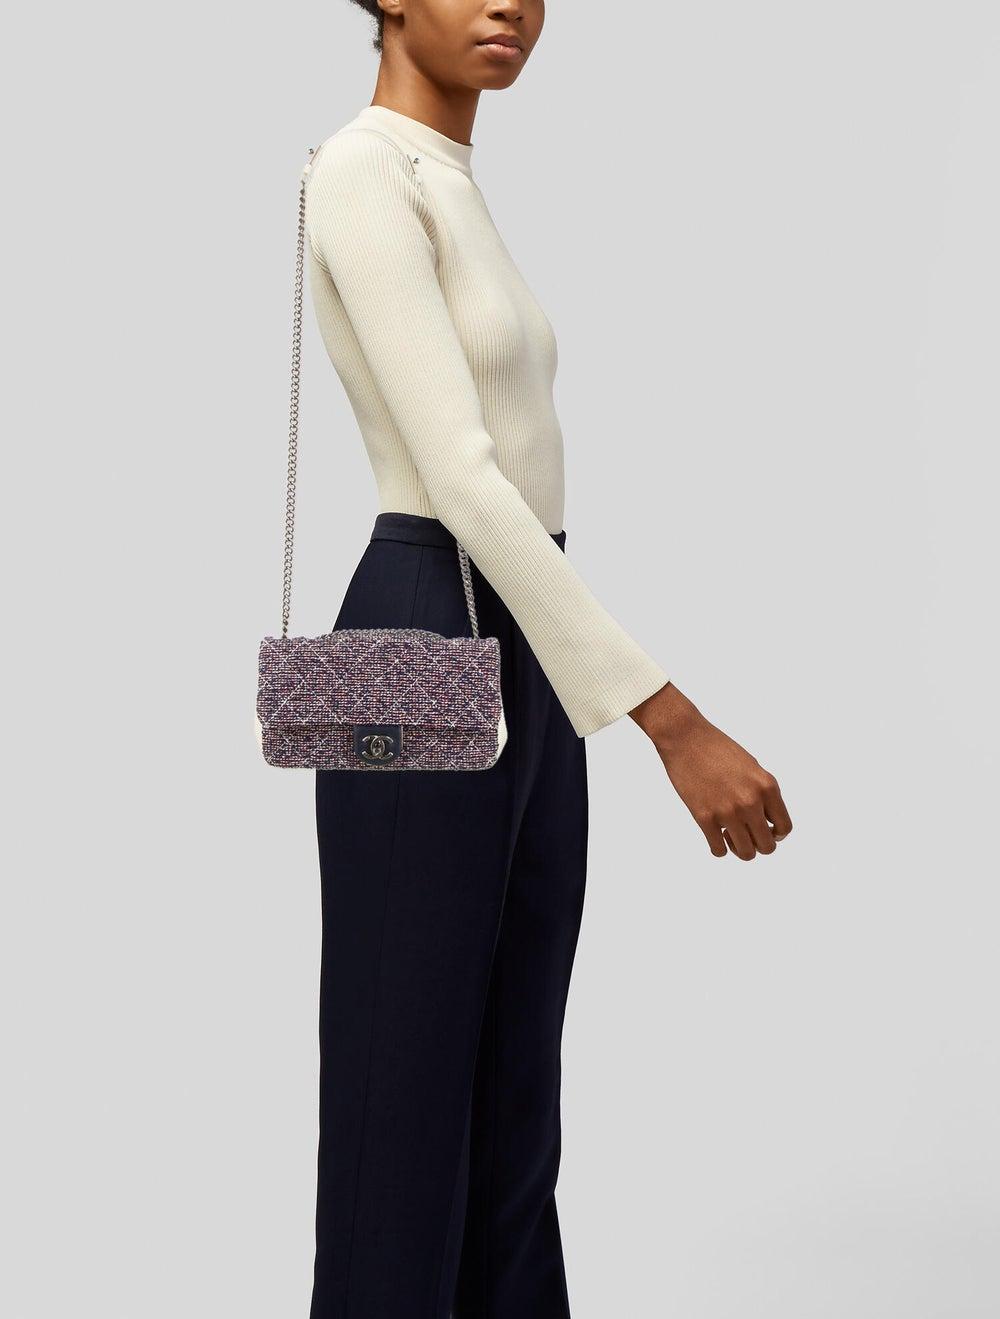 Chanel Airlines Tweed Crossbody Bag Navy - image 2